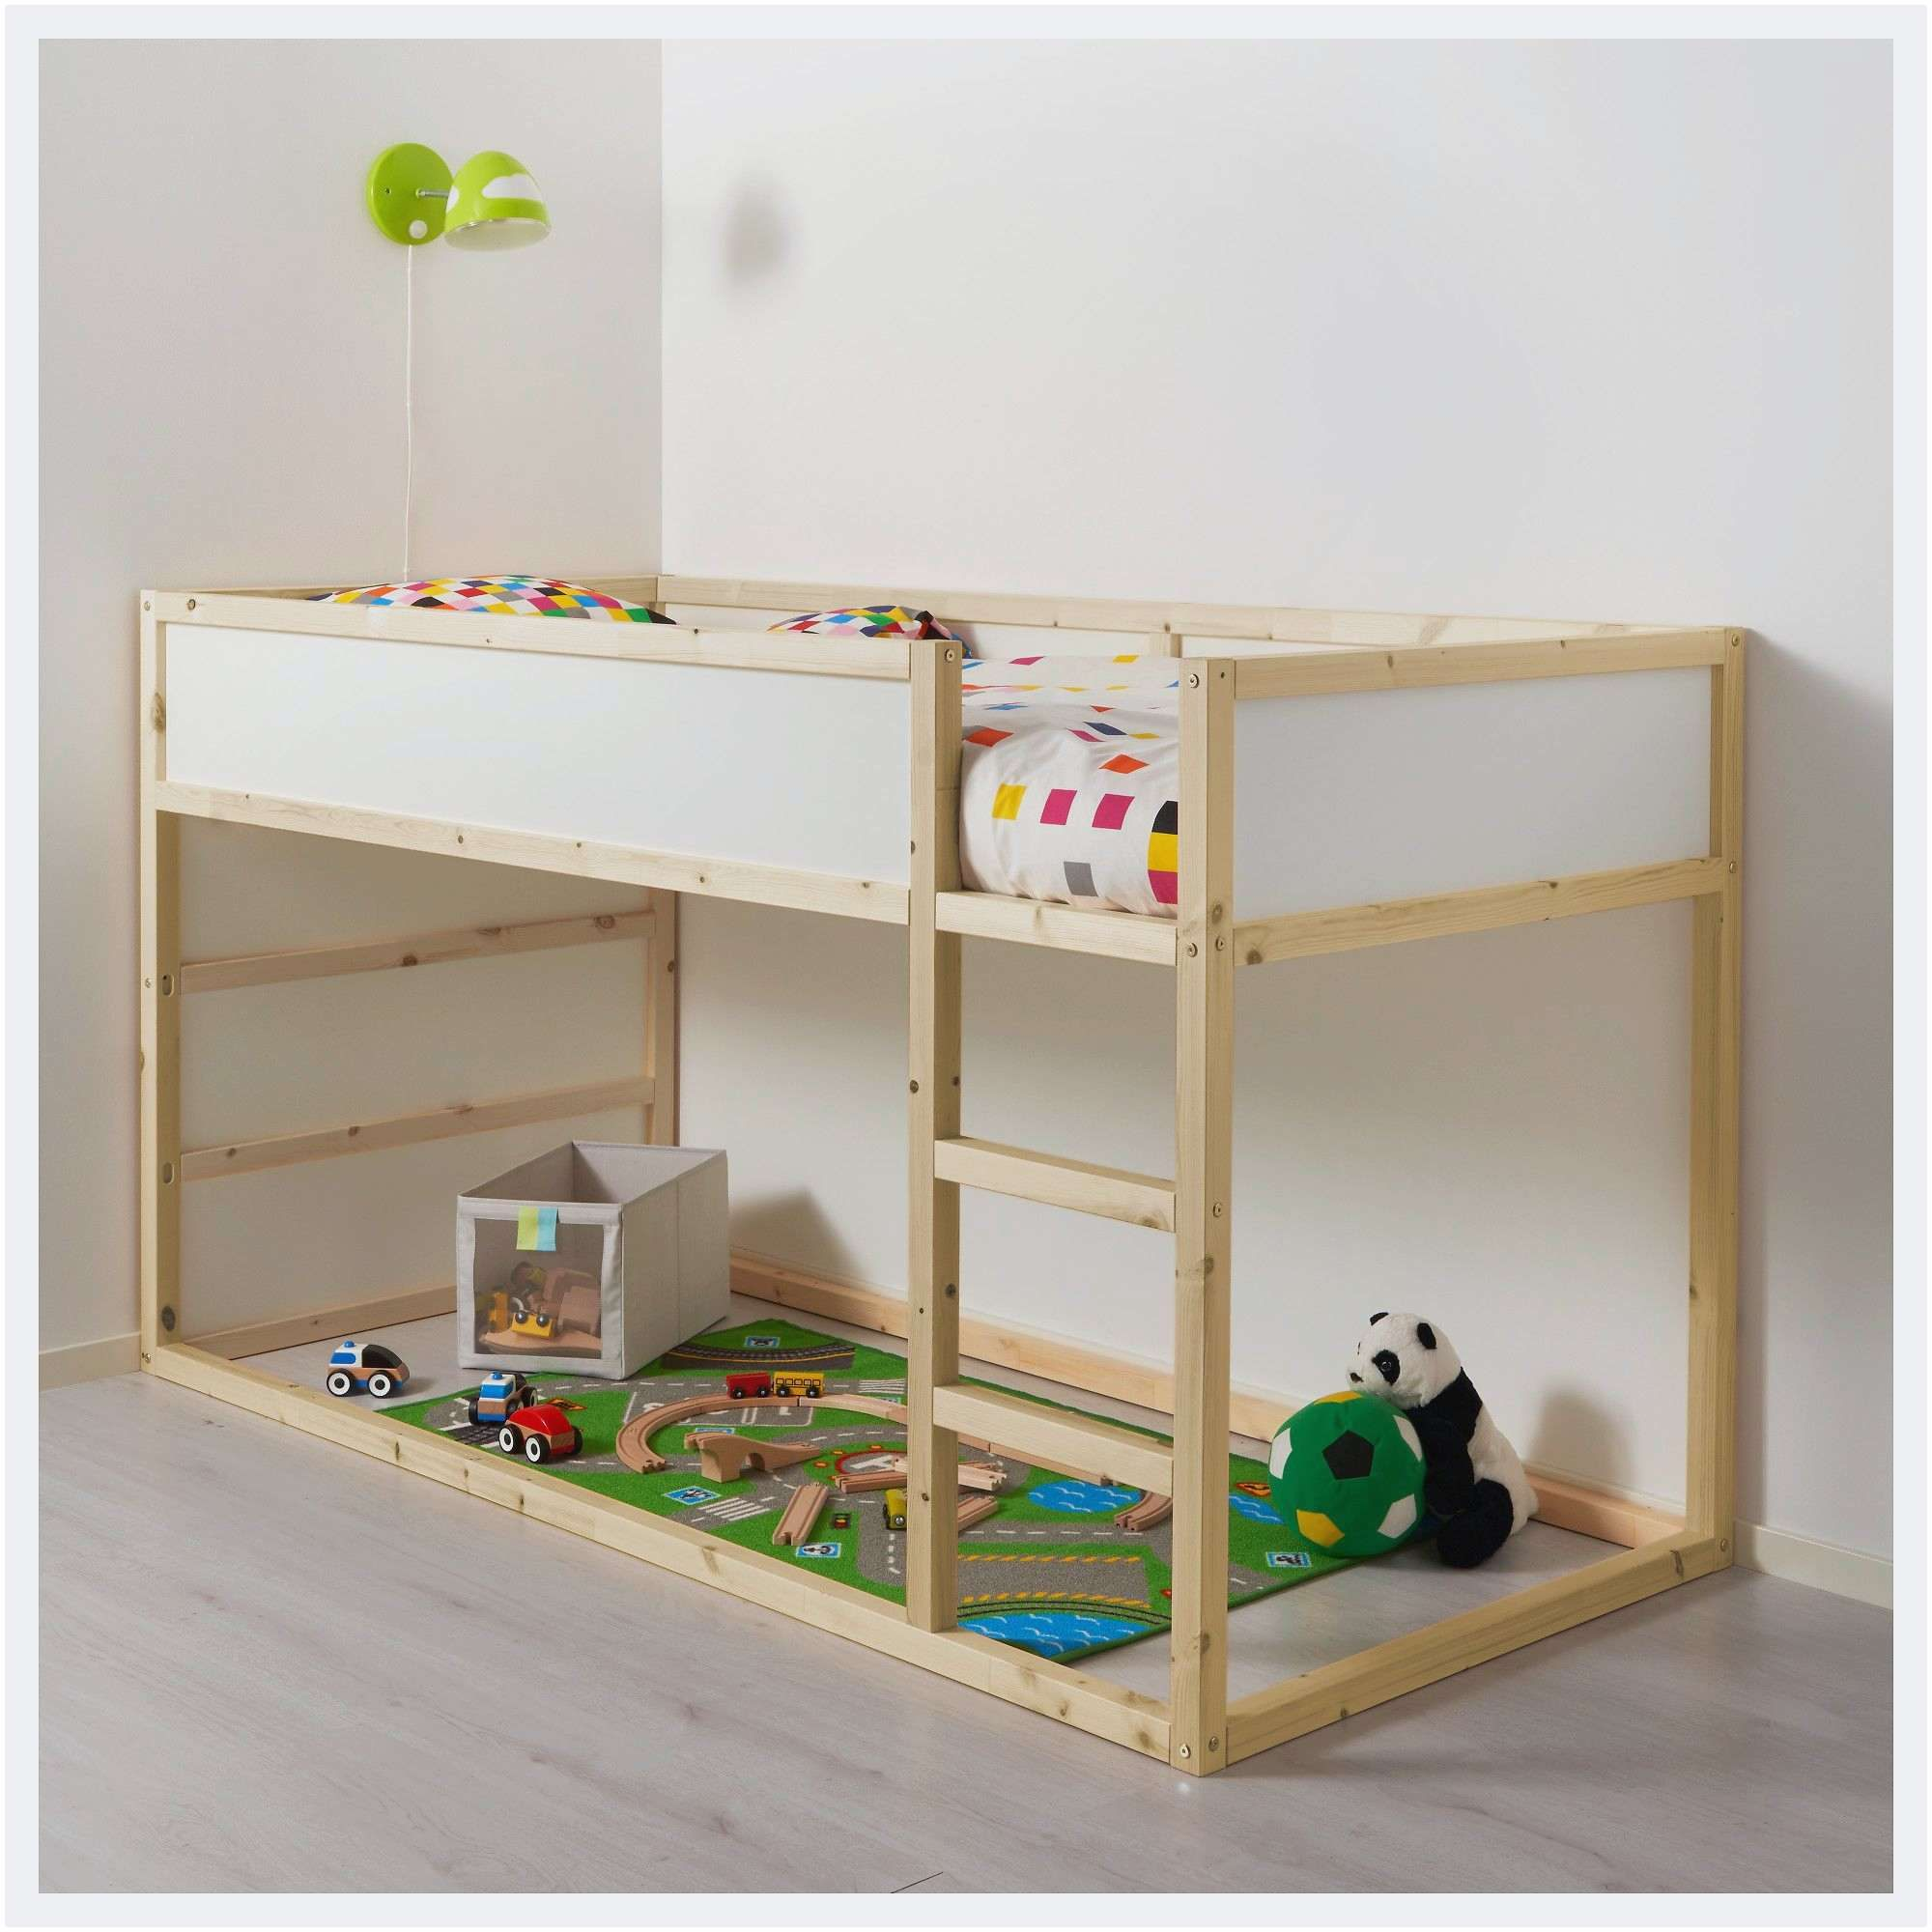 "Lit 140×190 Ikea Le Luxe Inspiré Kura ŽÅ¡ ŽµŽ²Ž¬""Ž¹ Ž´Ž¹€Ž Ž ' Å'Ë†Ž·' Ikea toddler S"